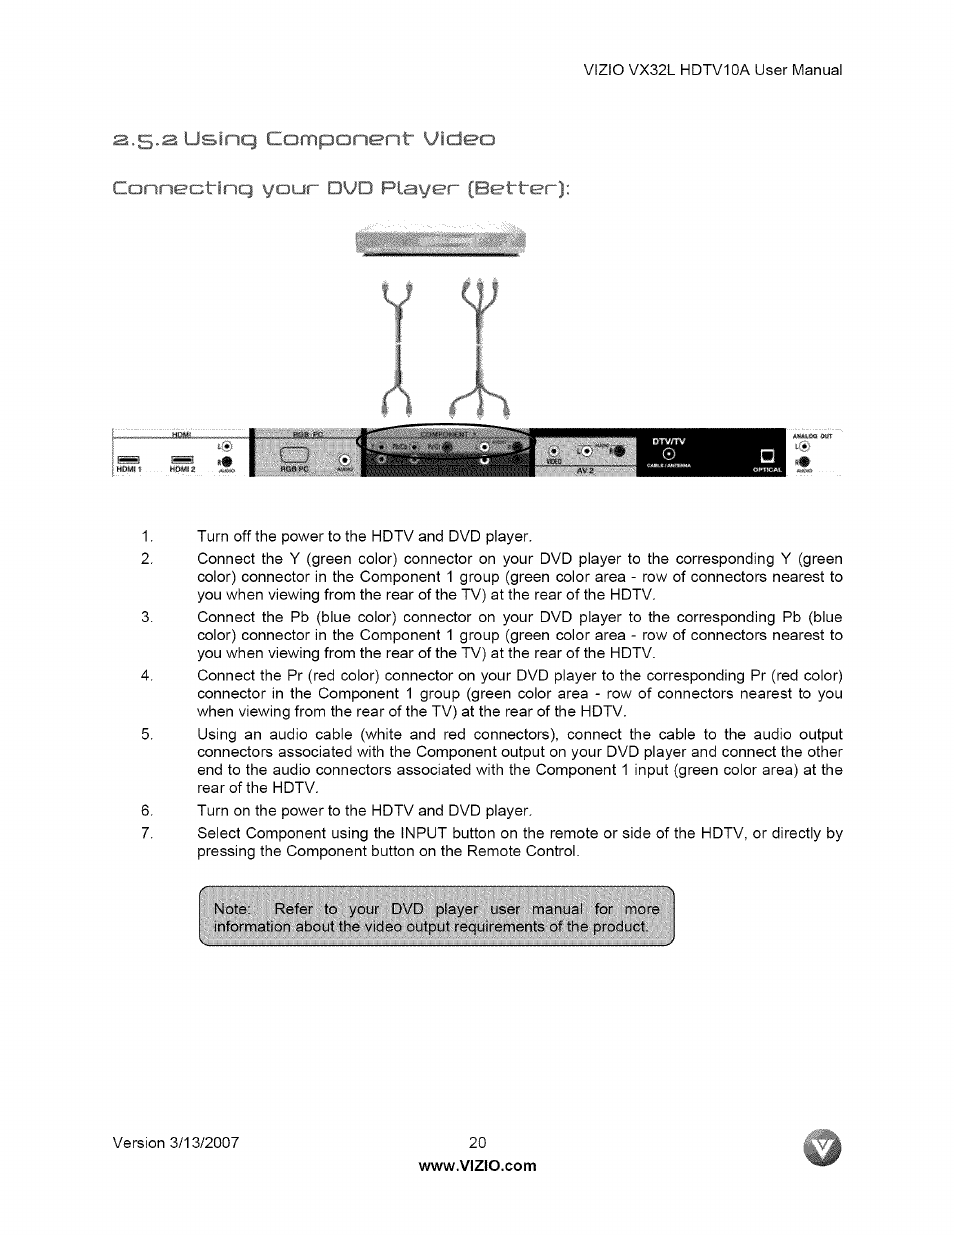 i i sinq video vizio vx32l user manual page 20 55 rh manualsdir com vizio vx32l hdtv10a user manual Vizio 32 HDTV